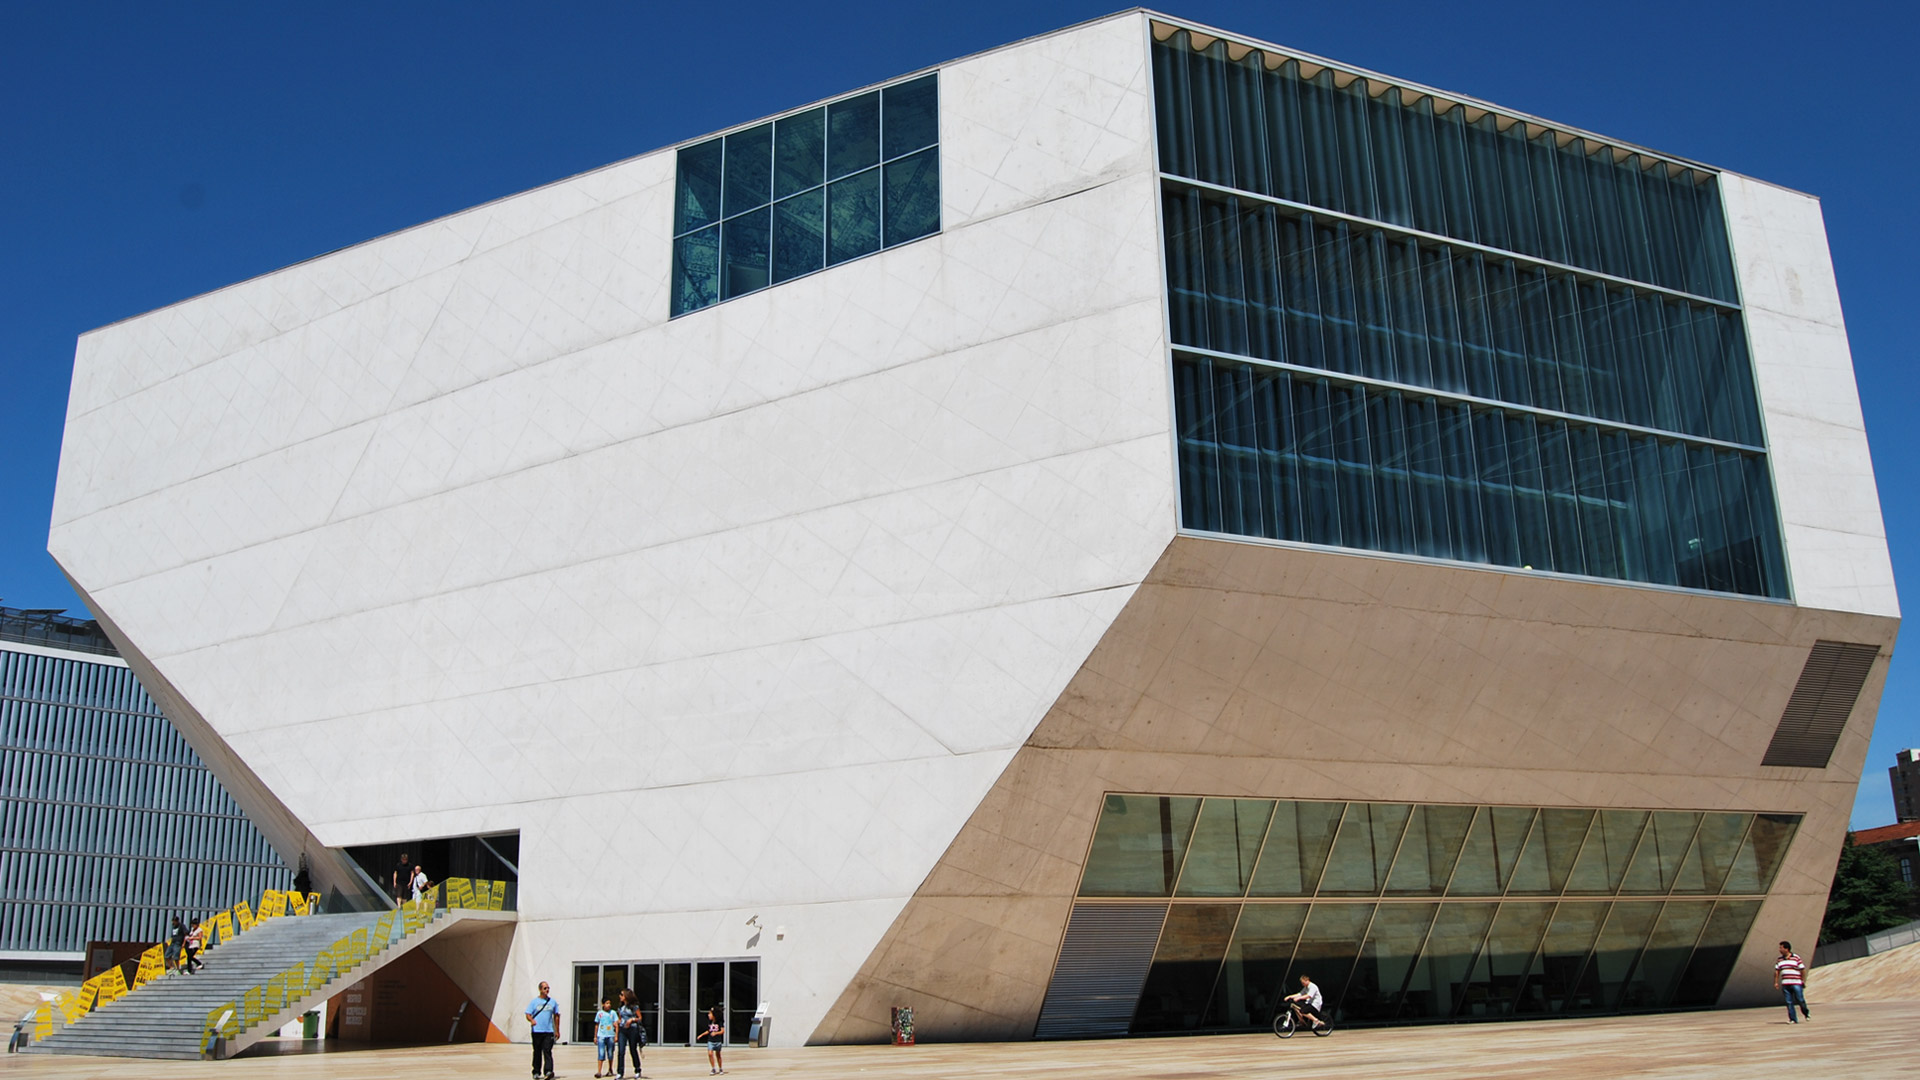 Portugal's Best Architecture Projects architecture Portugal's Best Architecture Projects casa da musica destaque